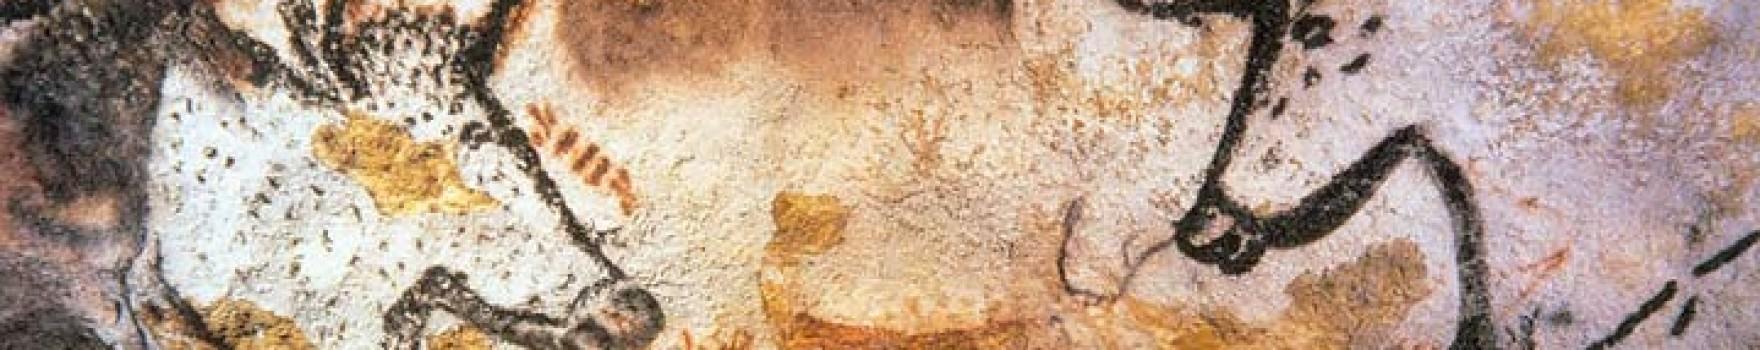 Grottes Dordogne